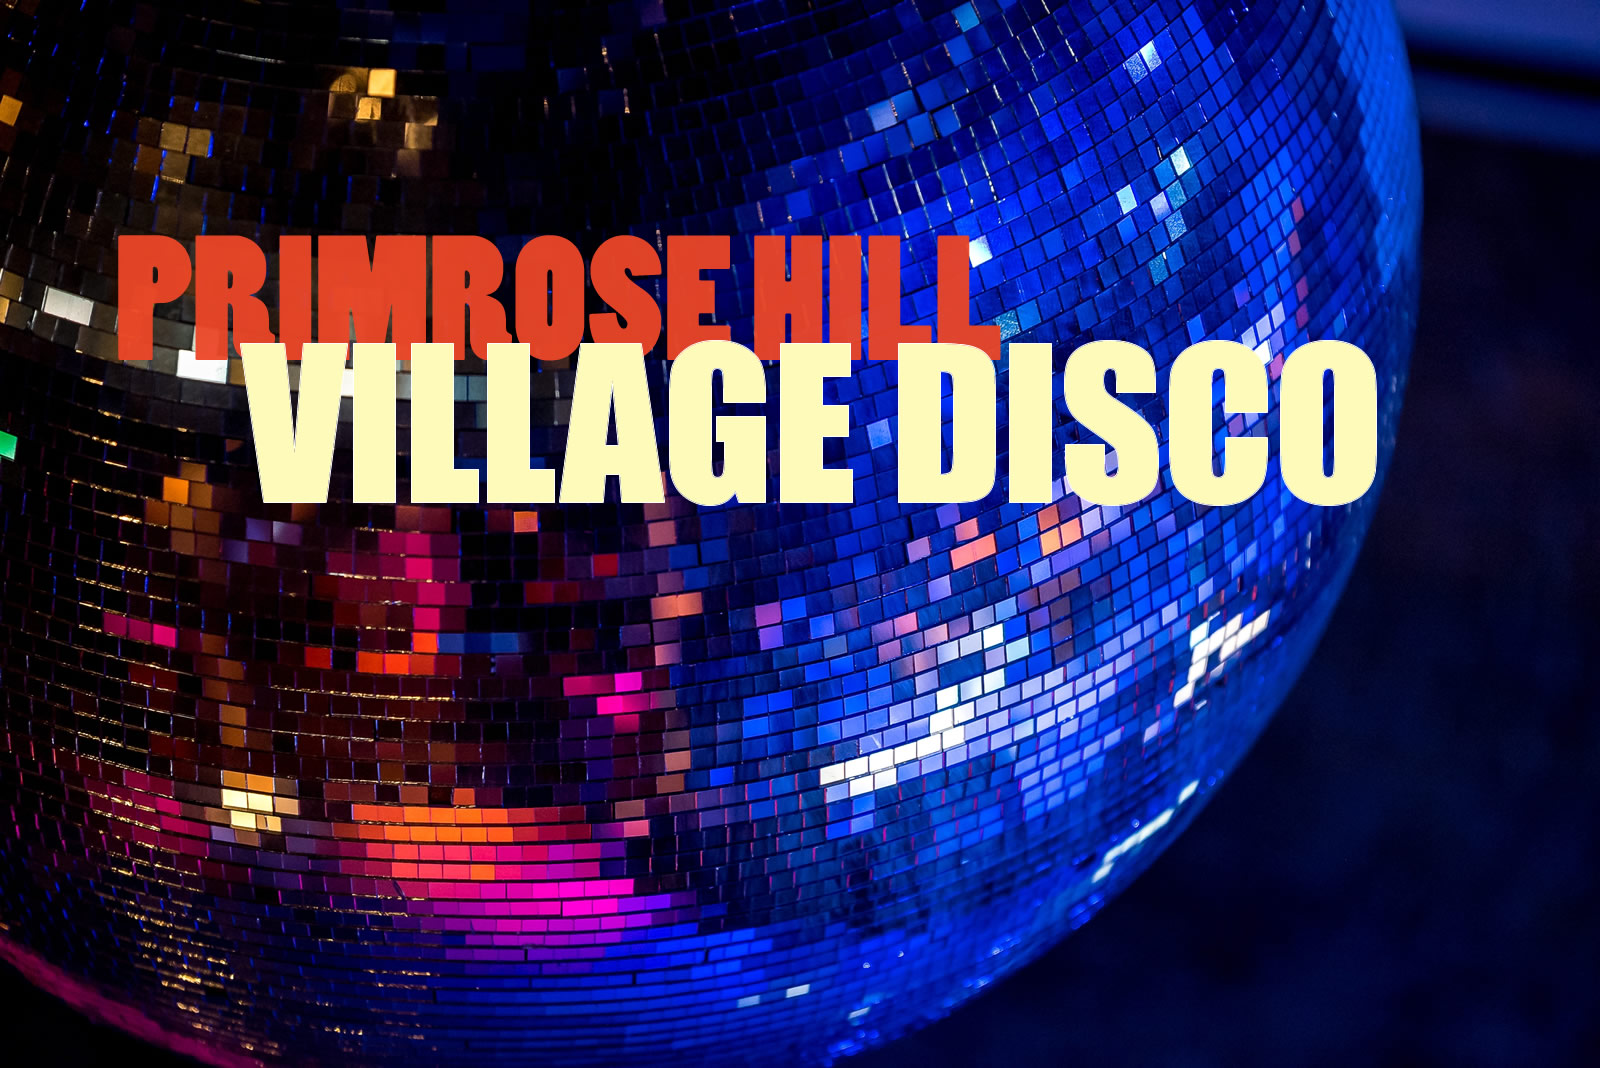 Primrose Hill Village Disco November 2019